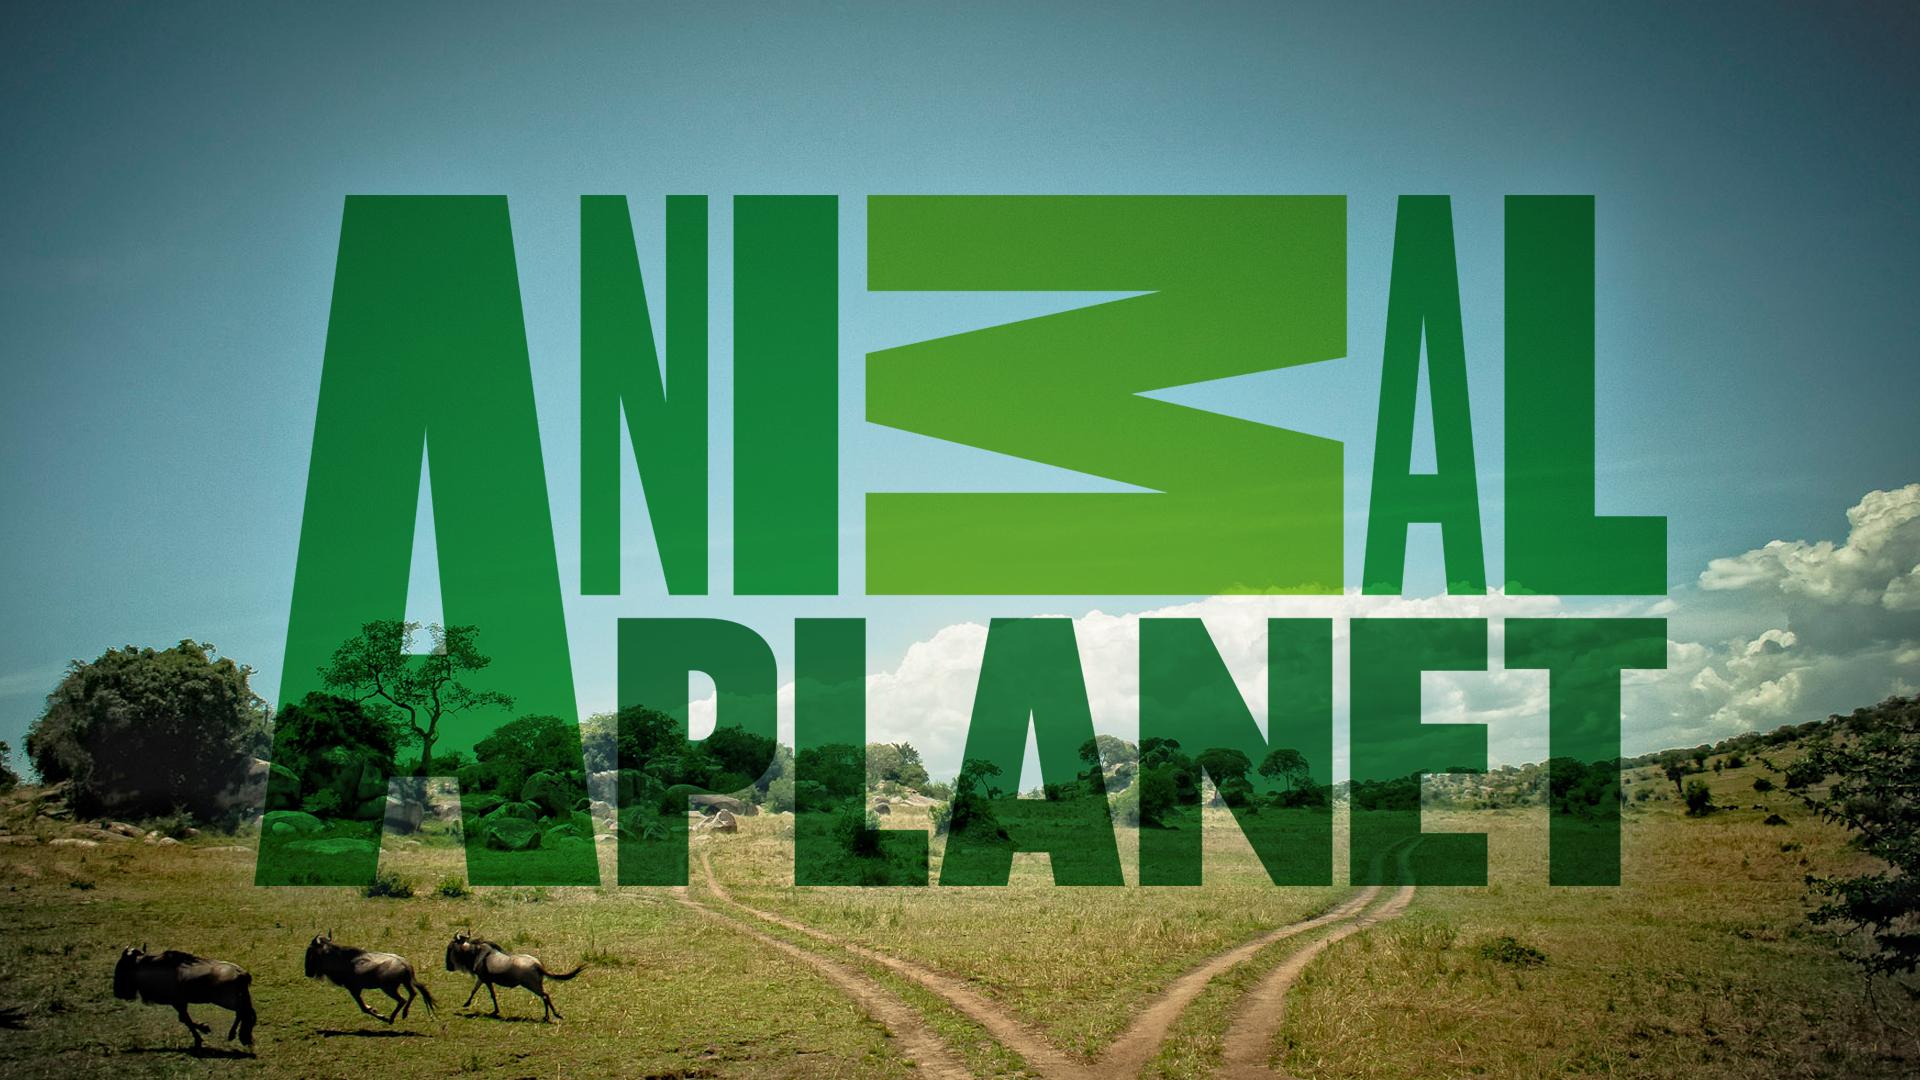 Телеканал анимал планет 22 фотография